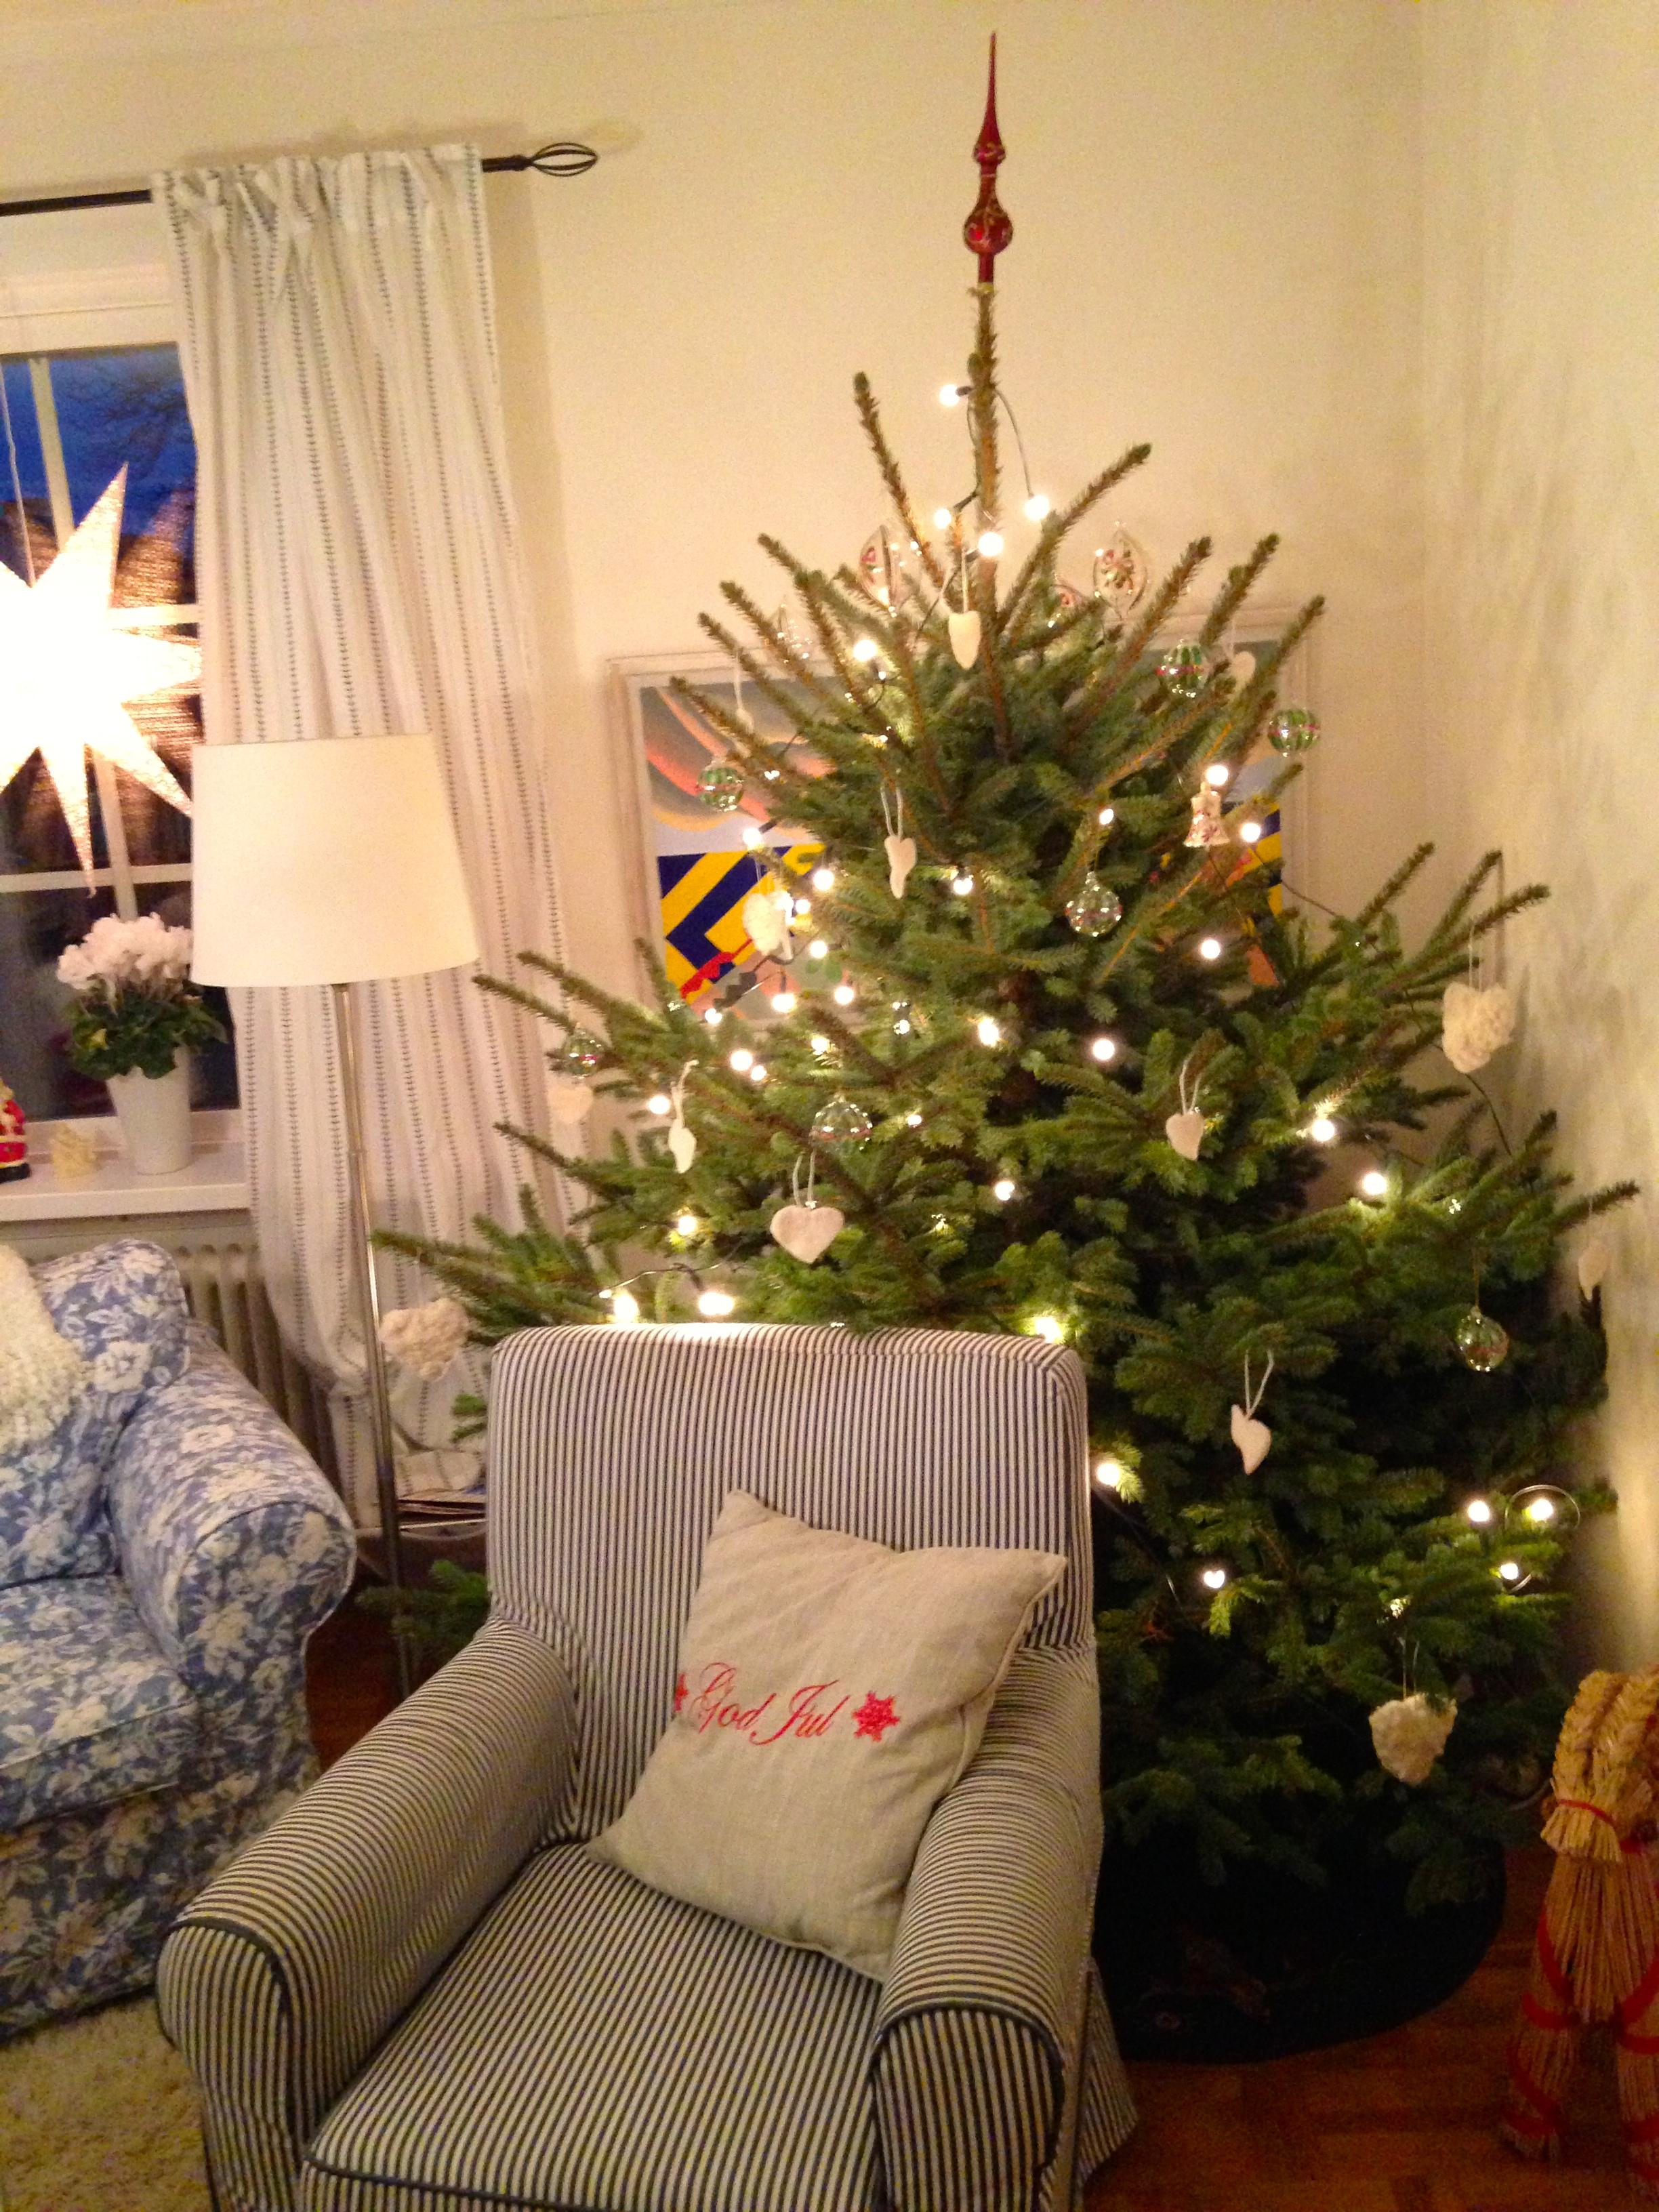 fileswedish christmas treejpg - Swedish Christmas Tree